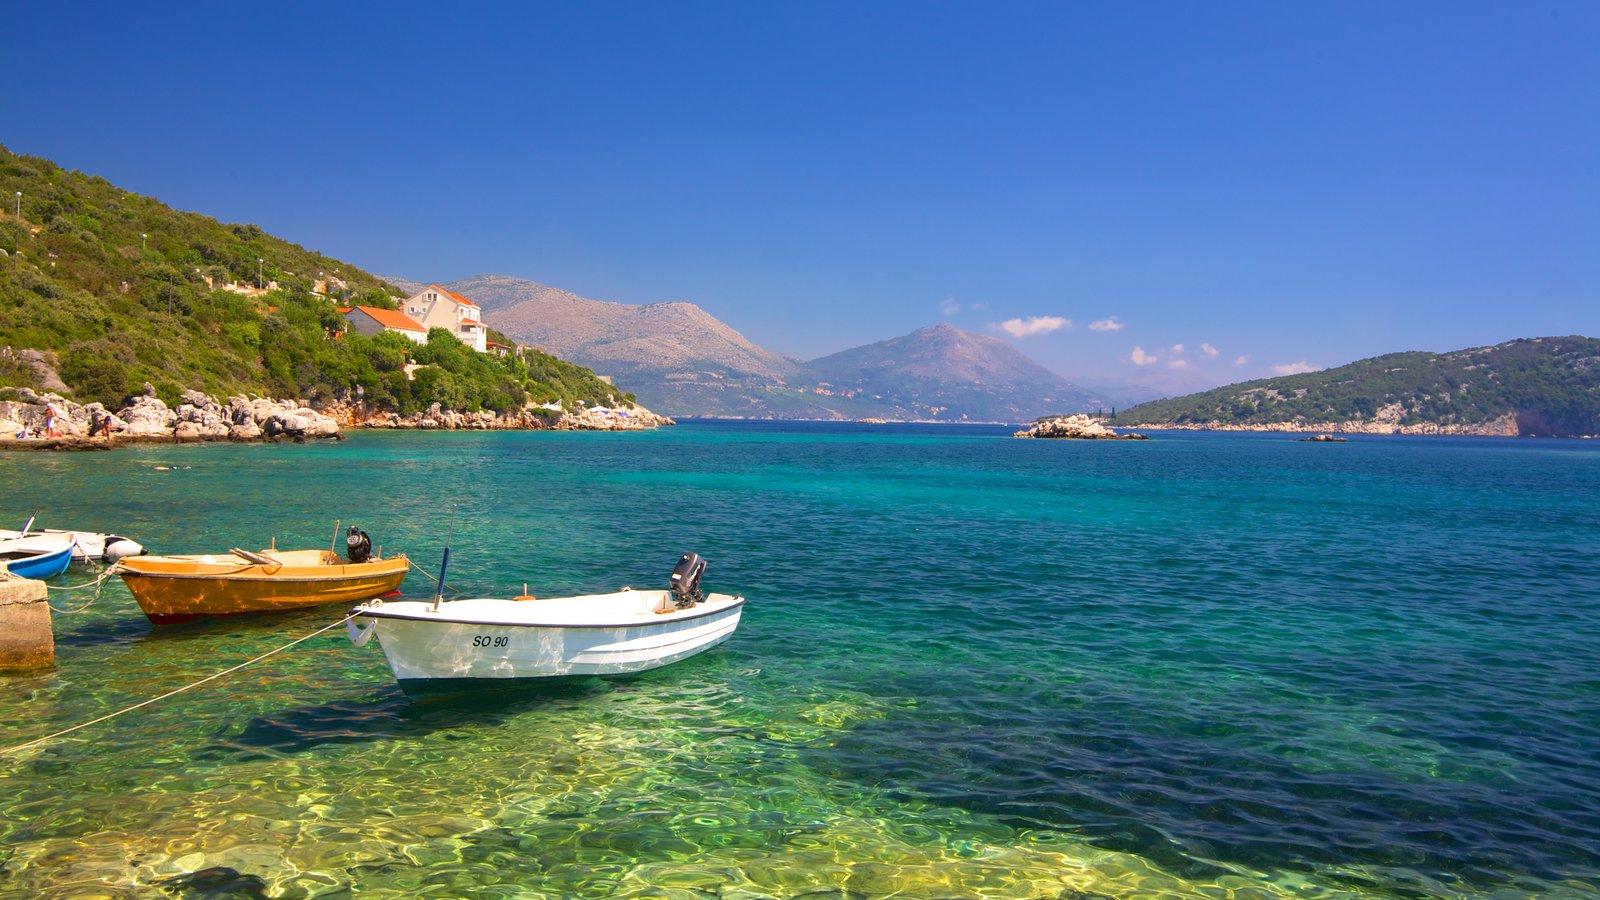 Dubrovnik - Southern Dalmatia showing general coastal views, boating and mountains